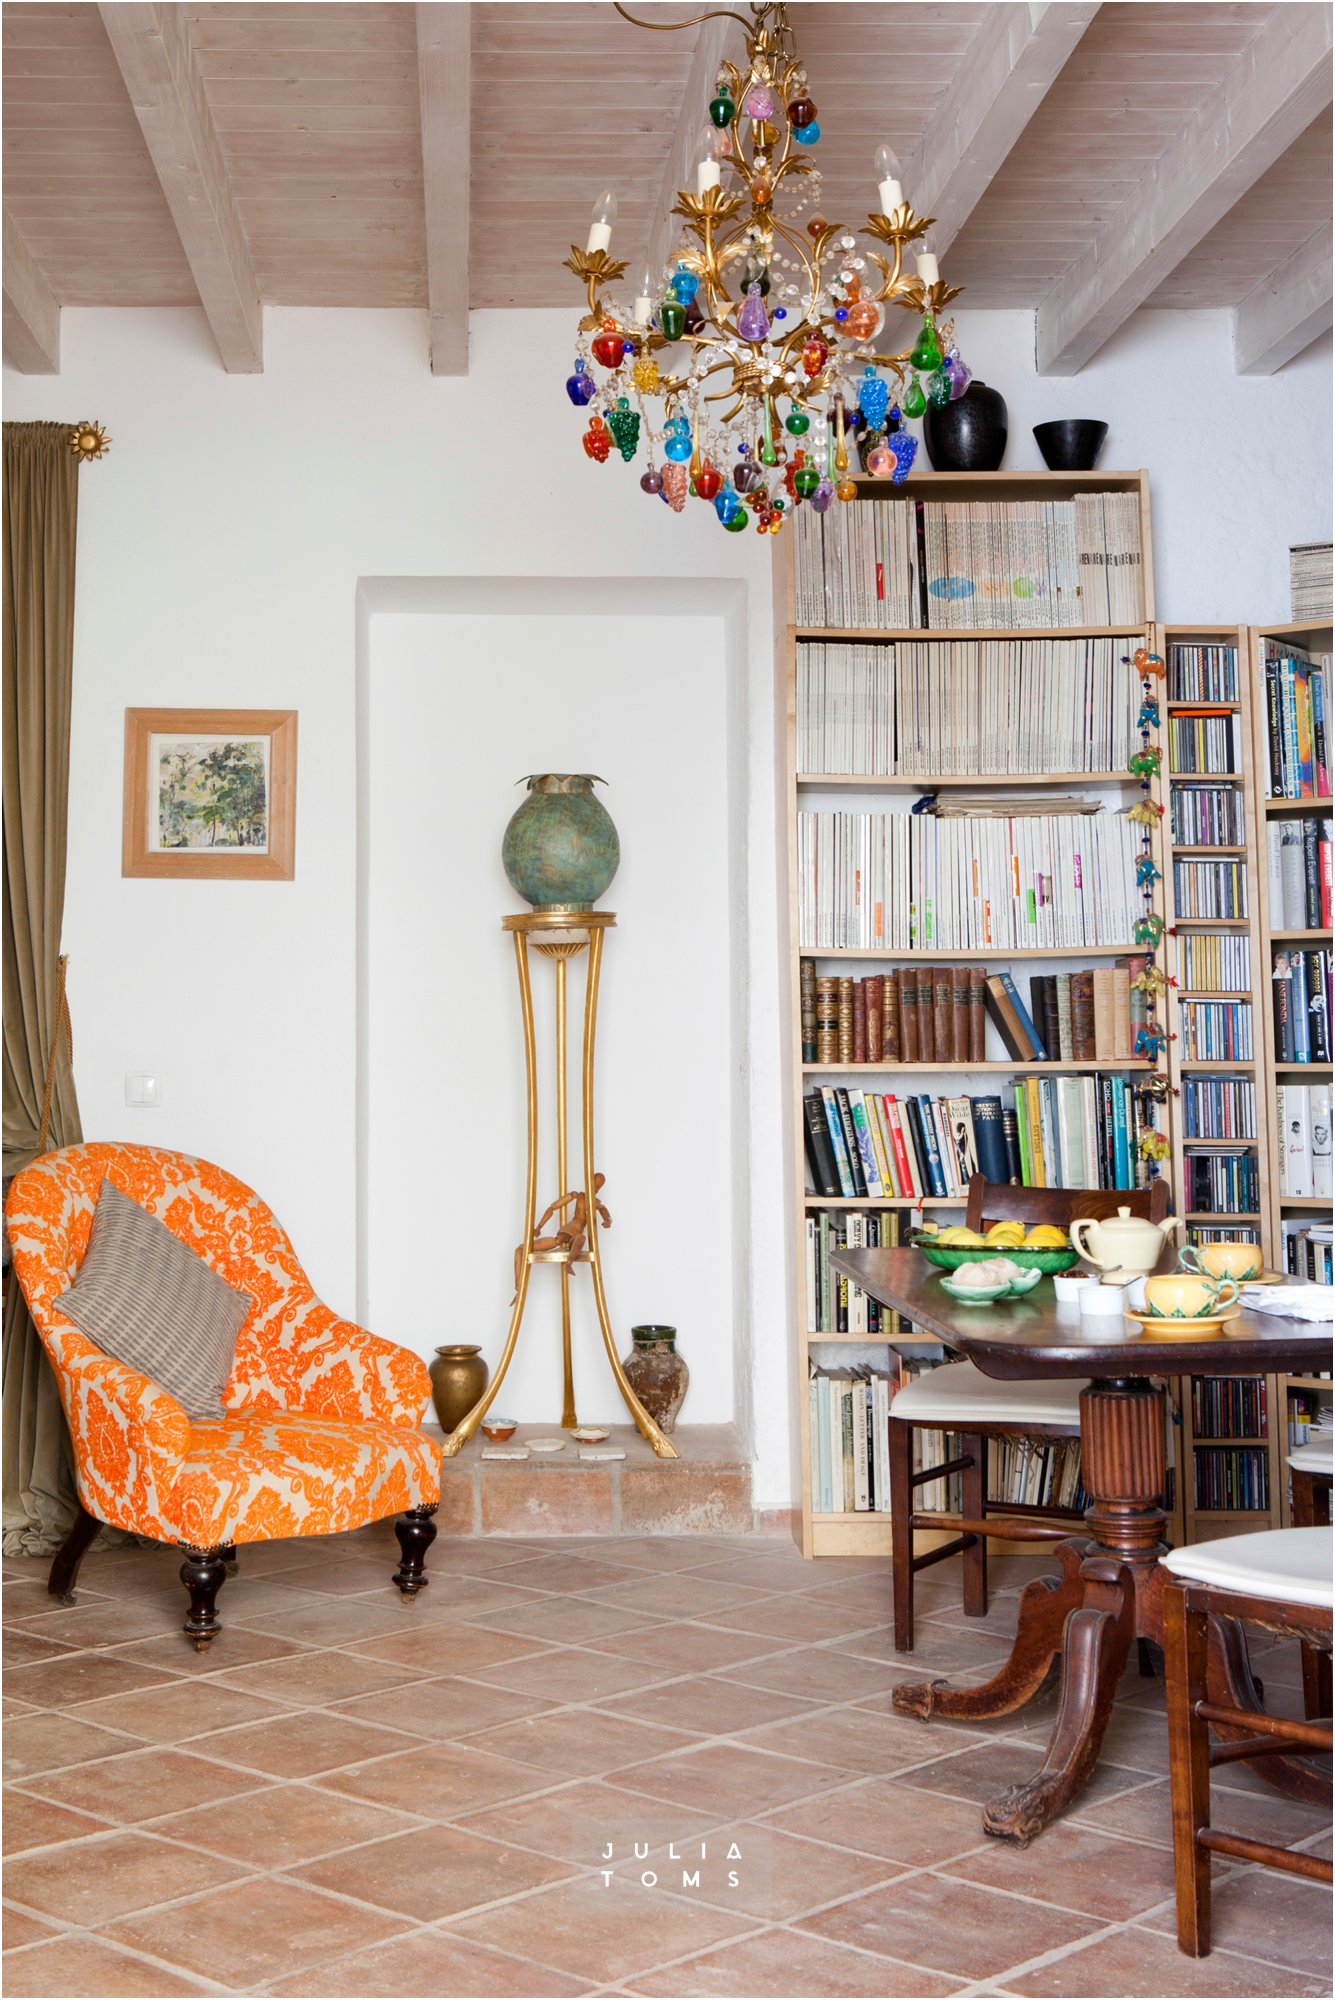 julia_toms_photography_interiors_magazine_002.jpg